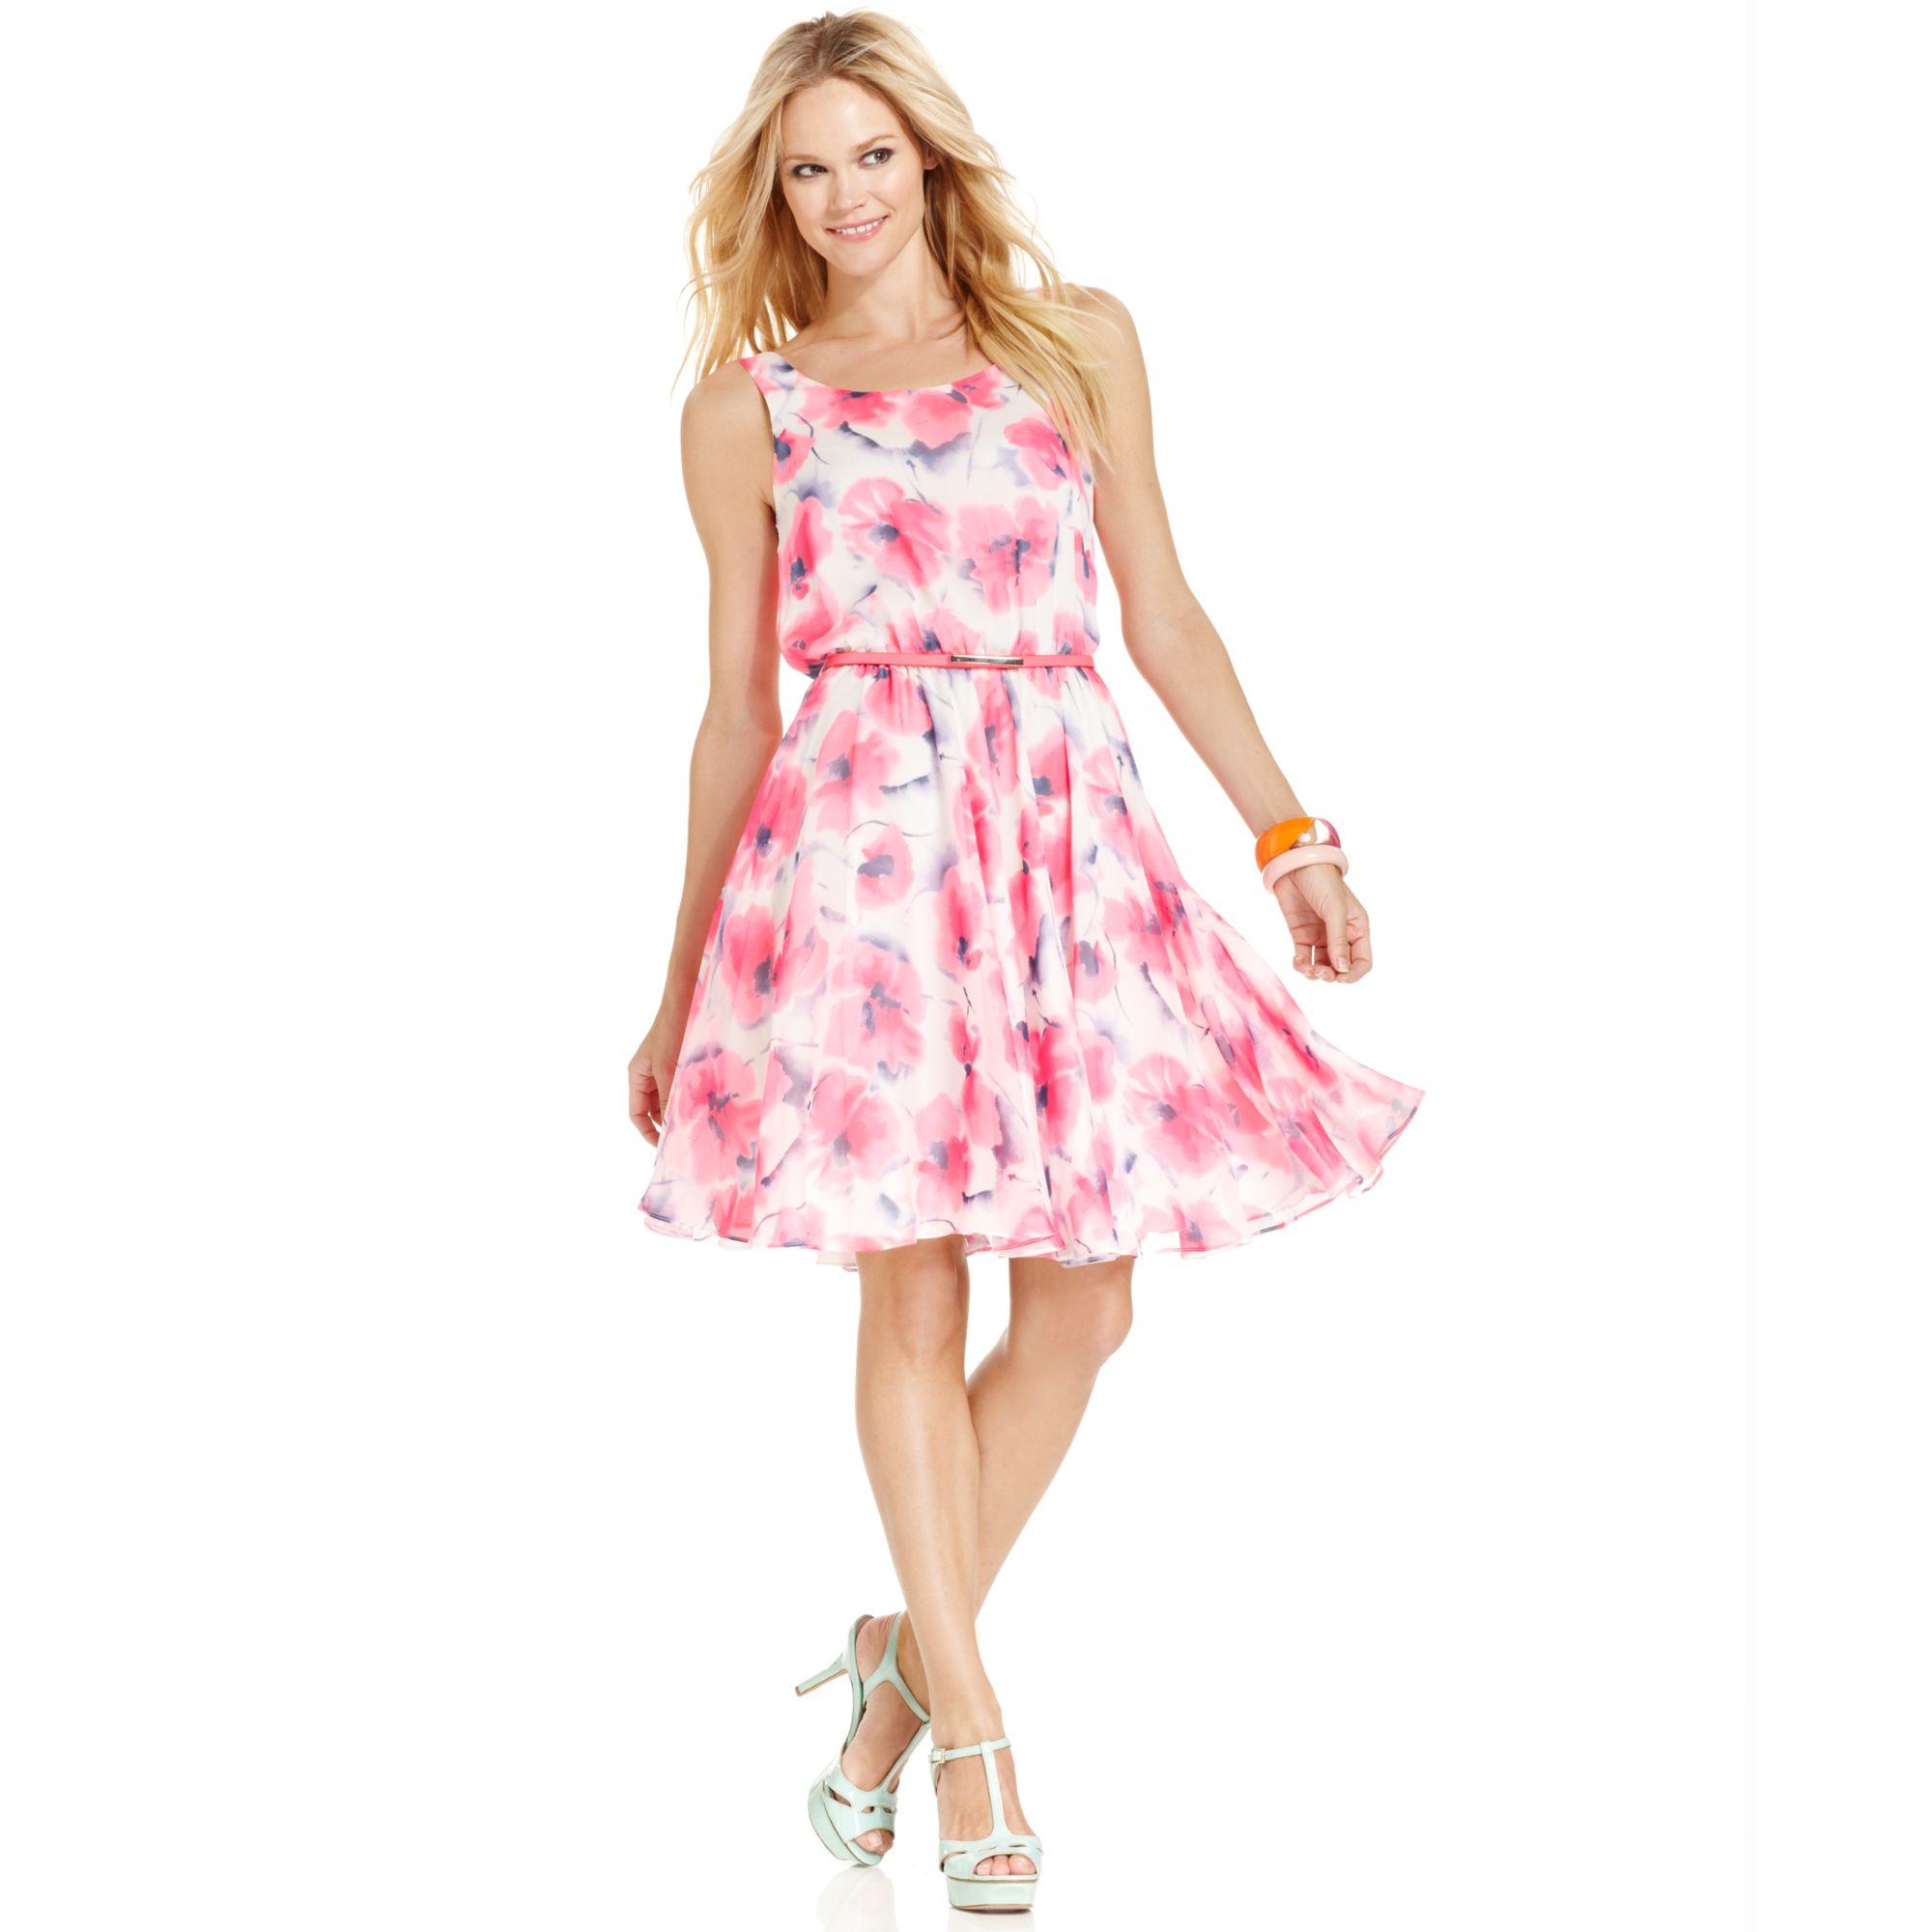 Betsey Johnson Sleeveless Floralprint Belted Dress In Pink Pink Multi Lyst